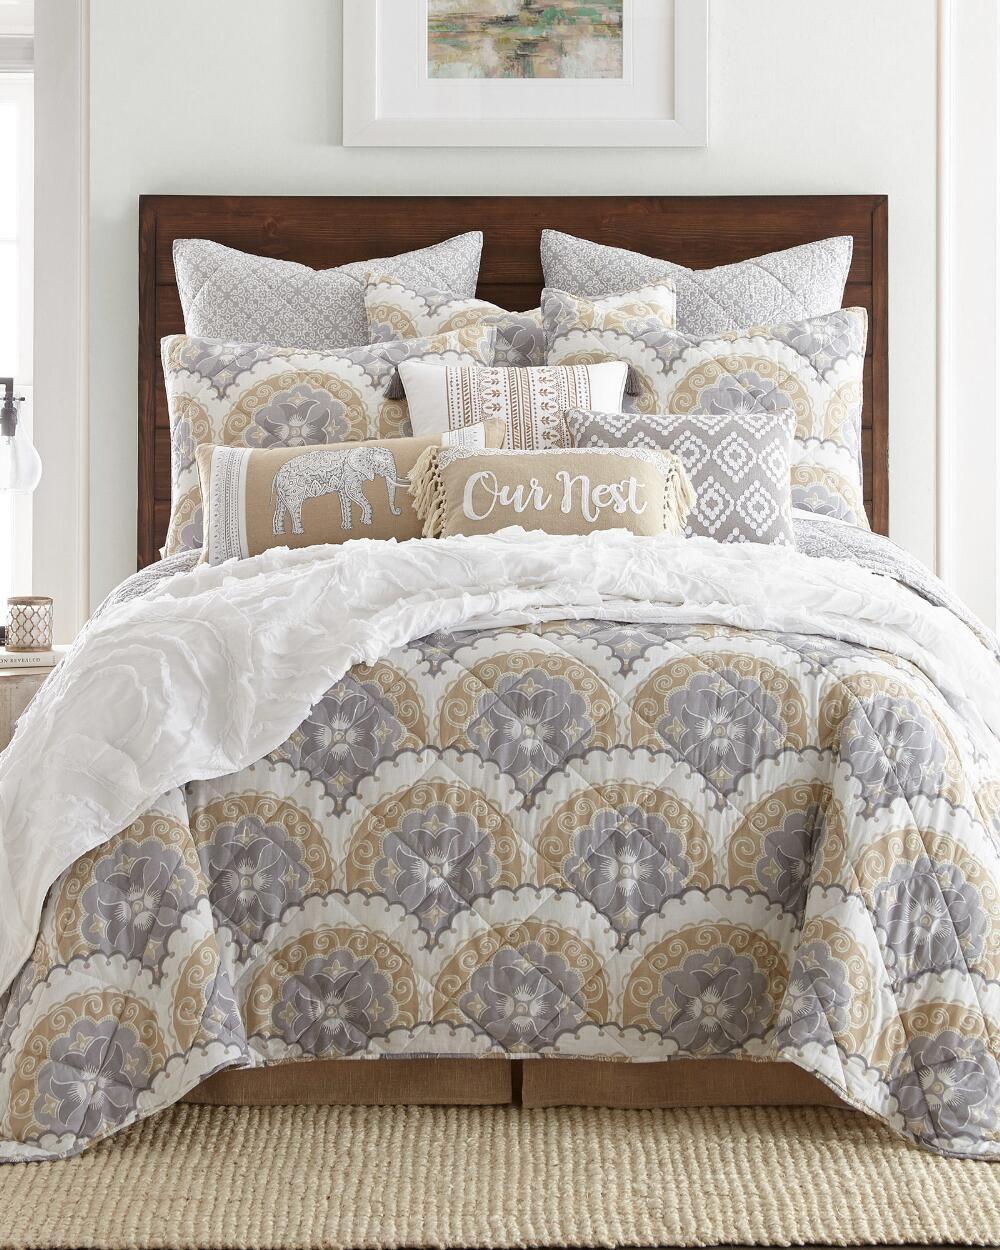 Stein mart bathroom accessories - Lucy Scalloped Medallion Quilt Collection Quilts Bedding Bed Bath Stein Mart